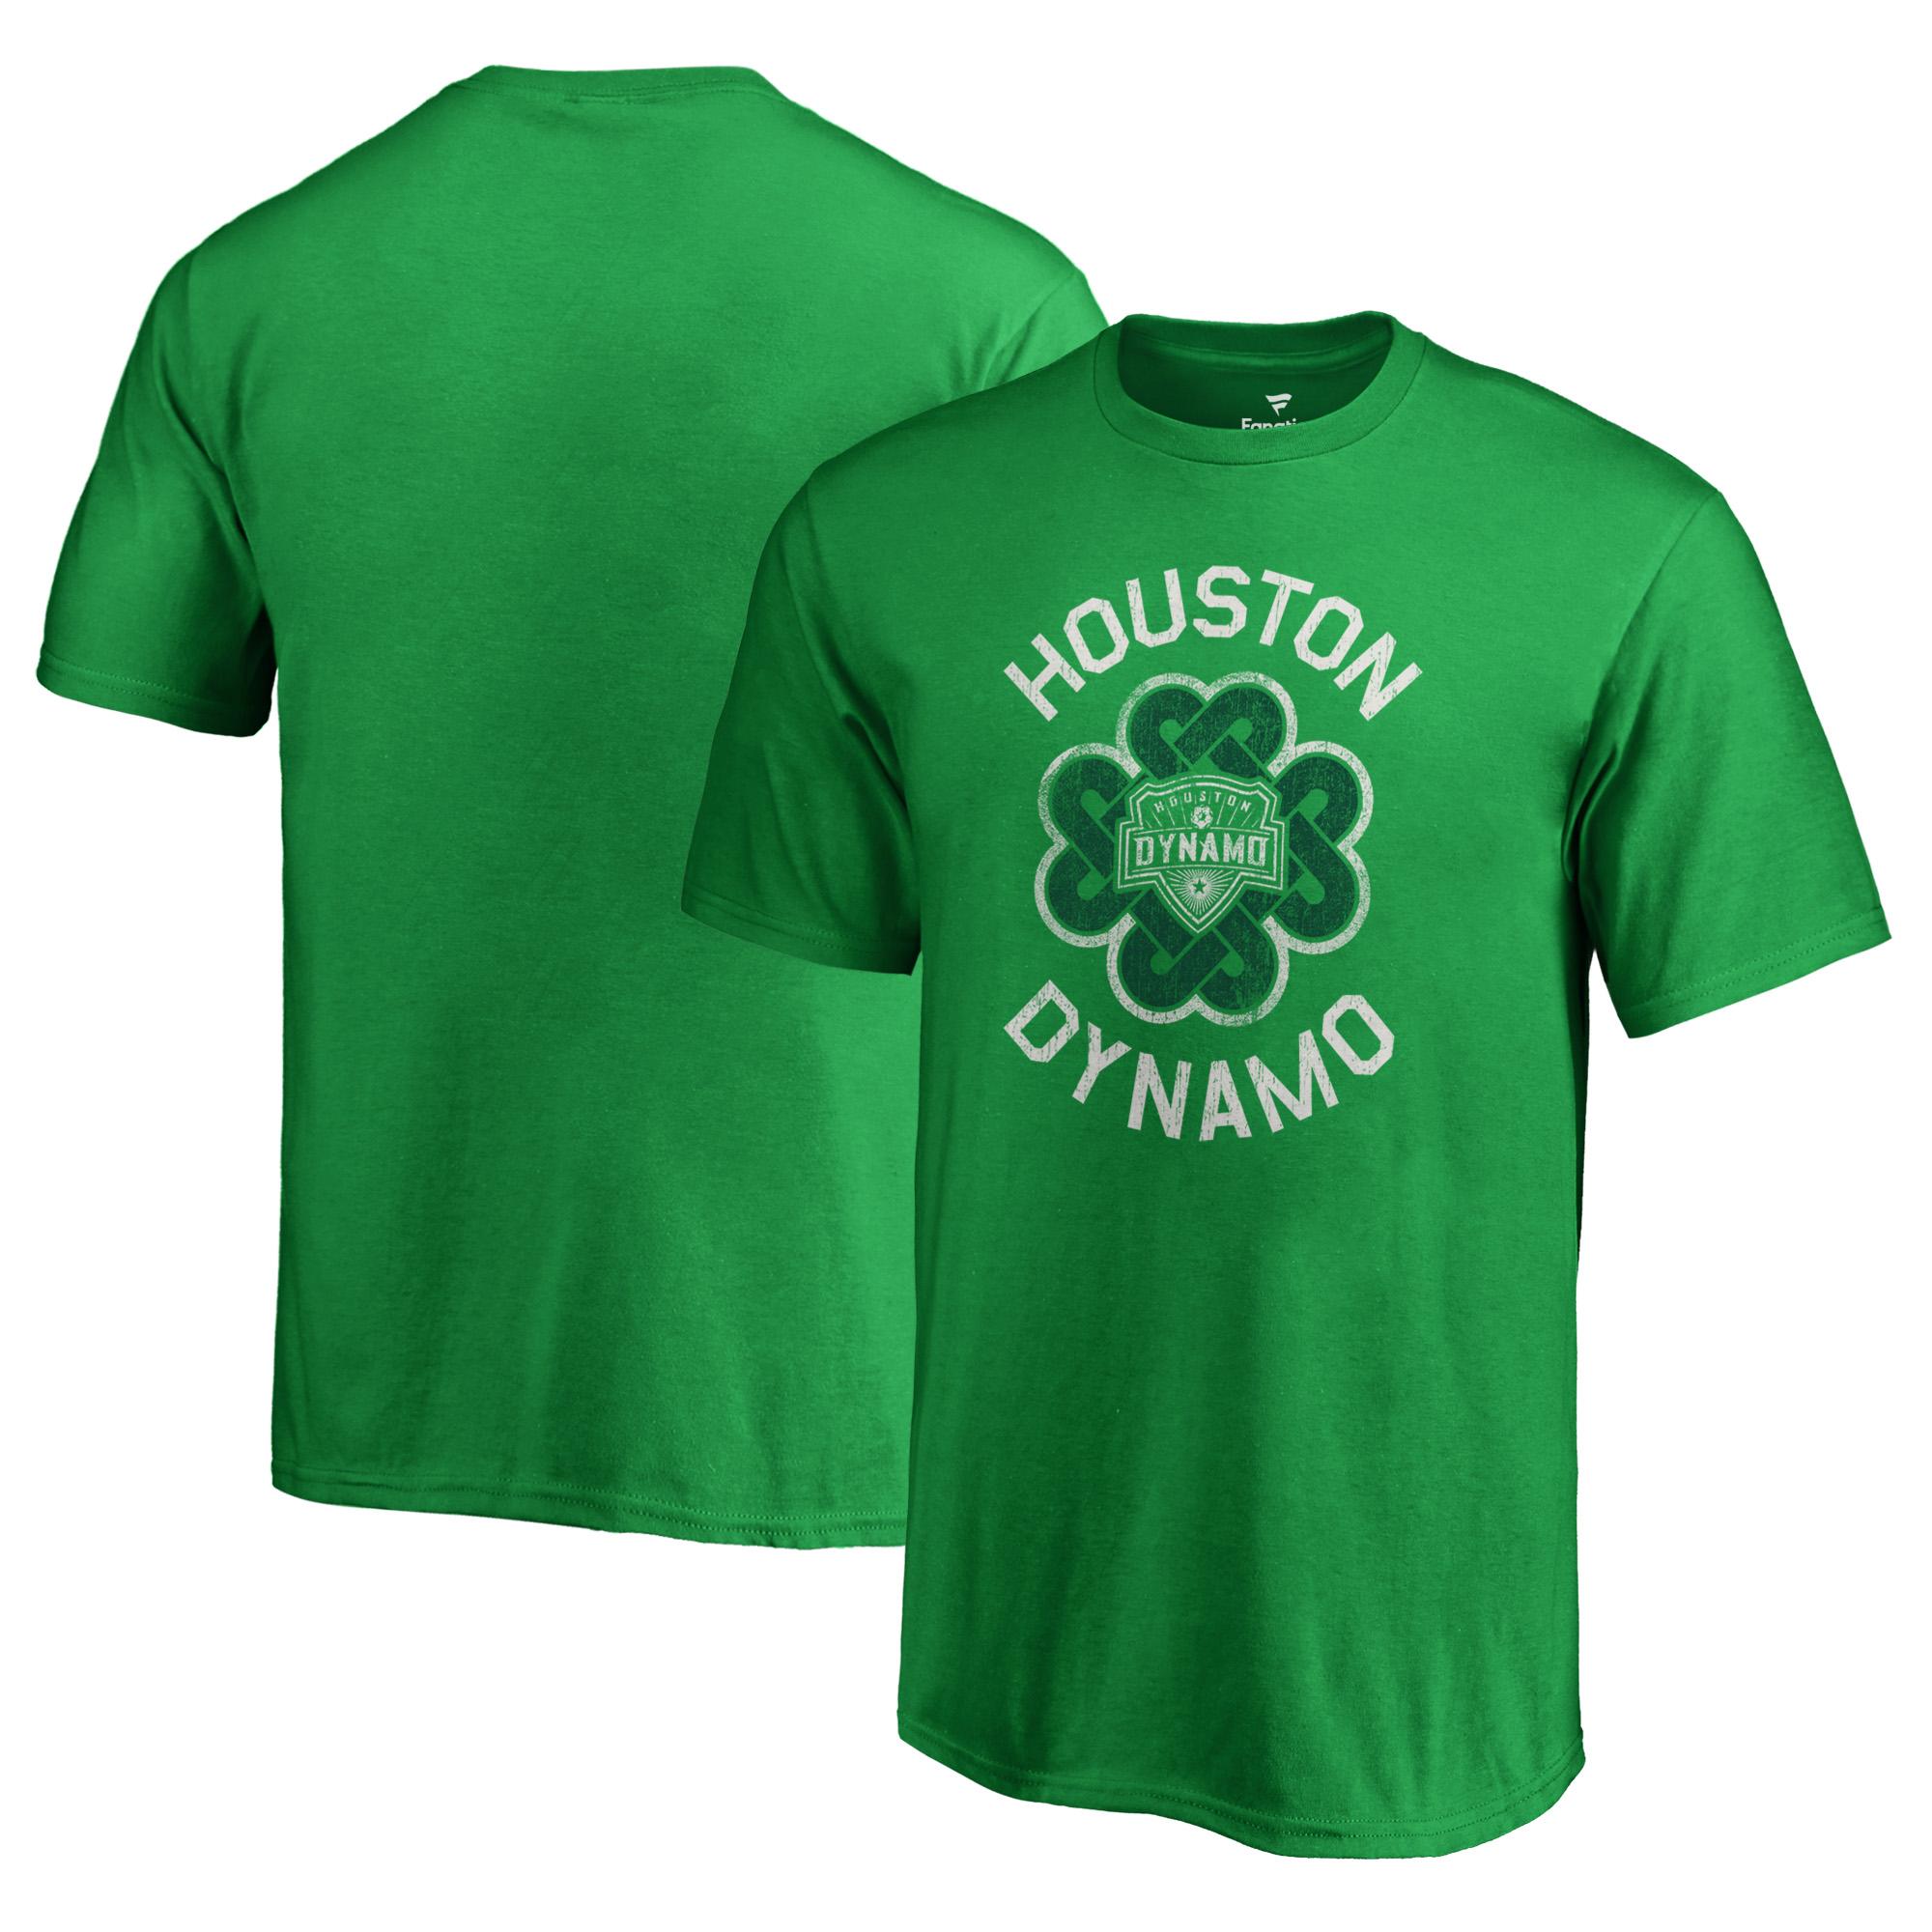 Houston Dynamo Fanatics Branded Youth St. Patrick's Day Luck Tradition T-Shirt - Kelly Green